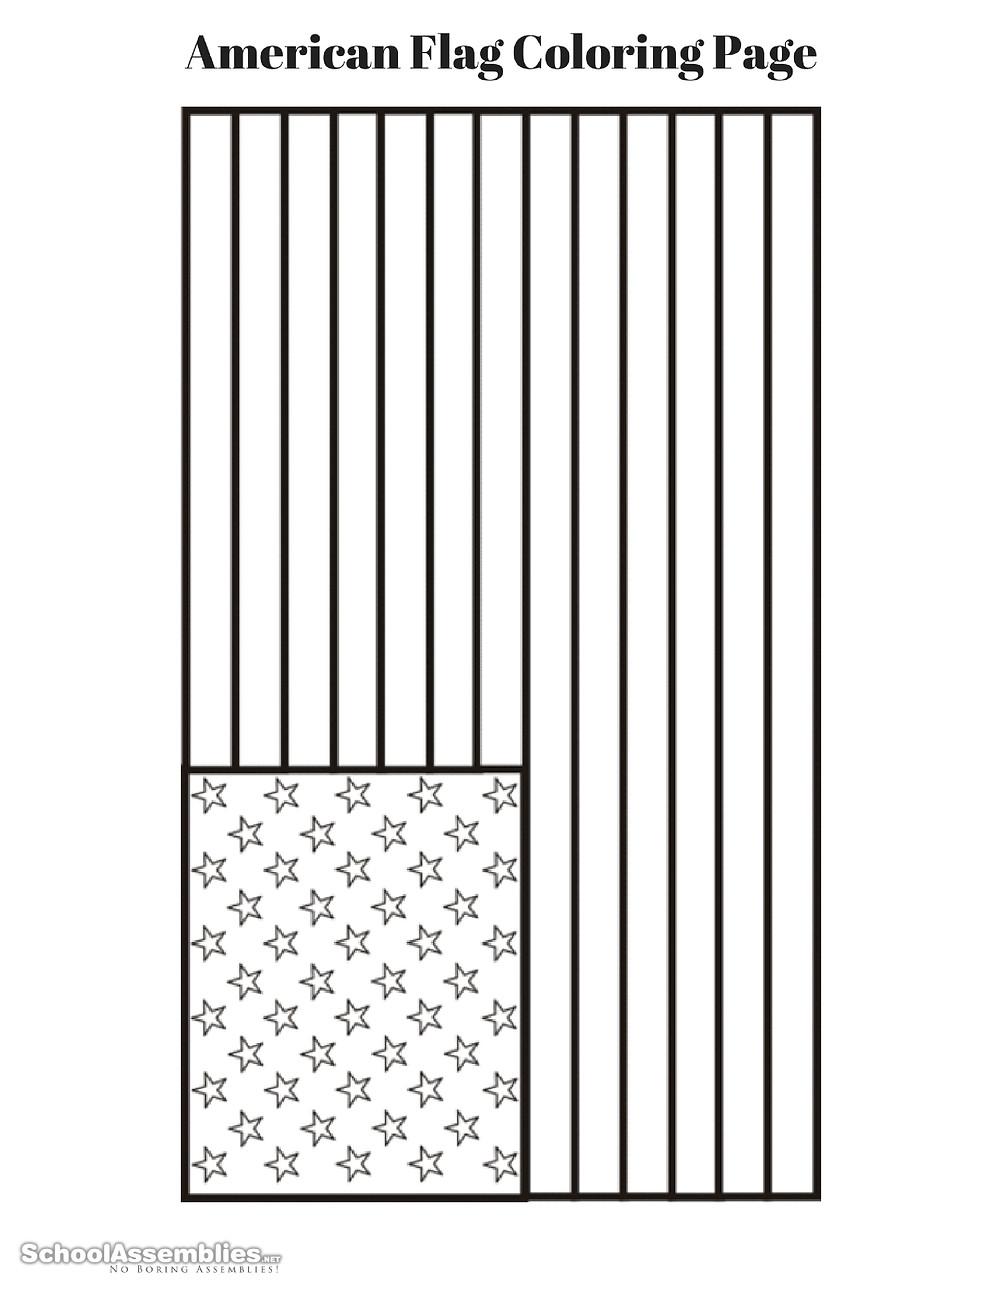 American Flag Coloring Page Free Printable